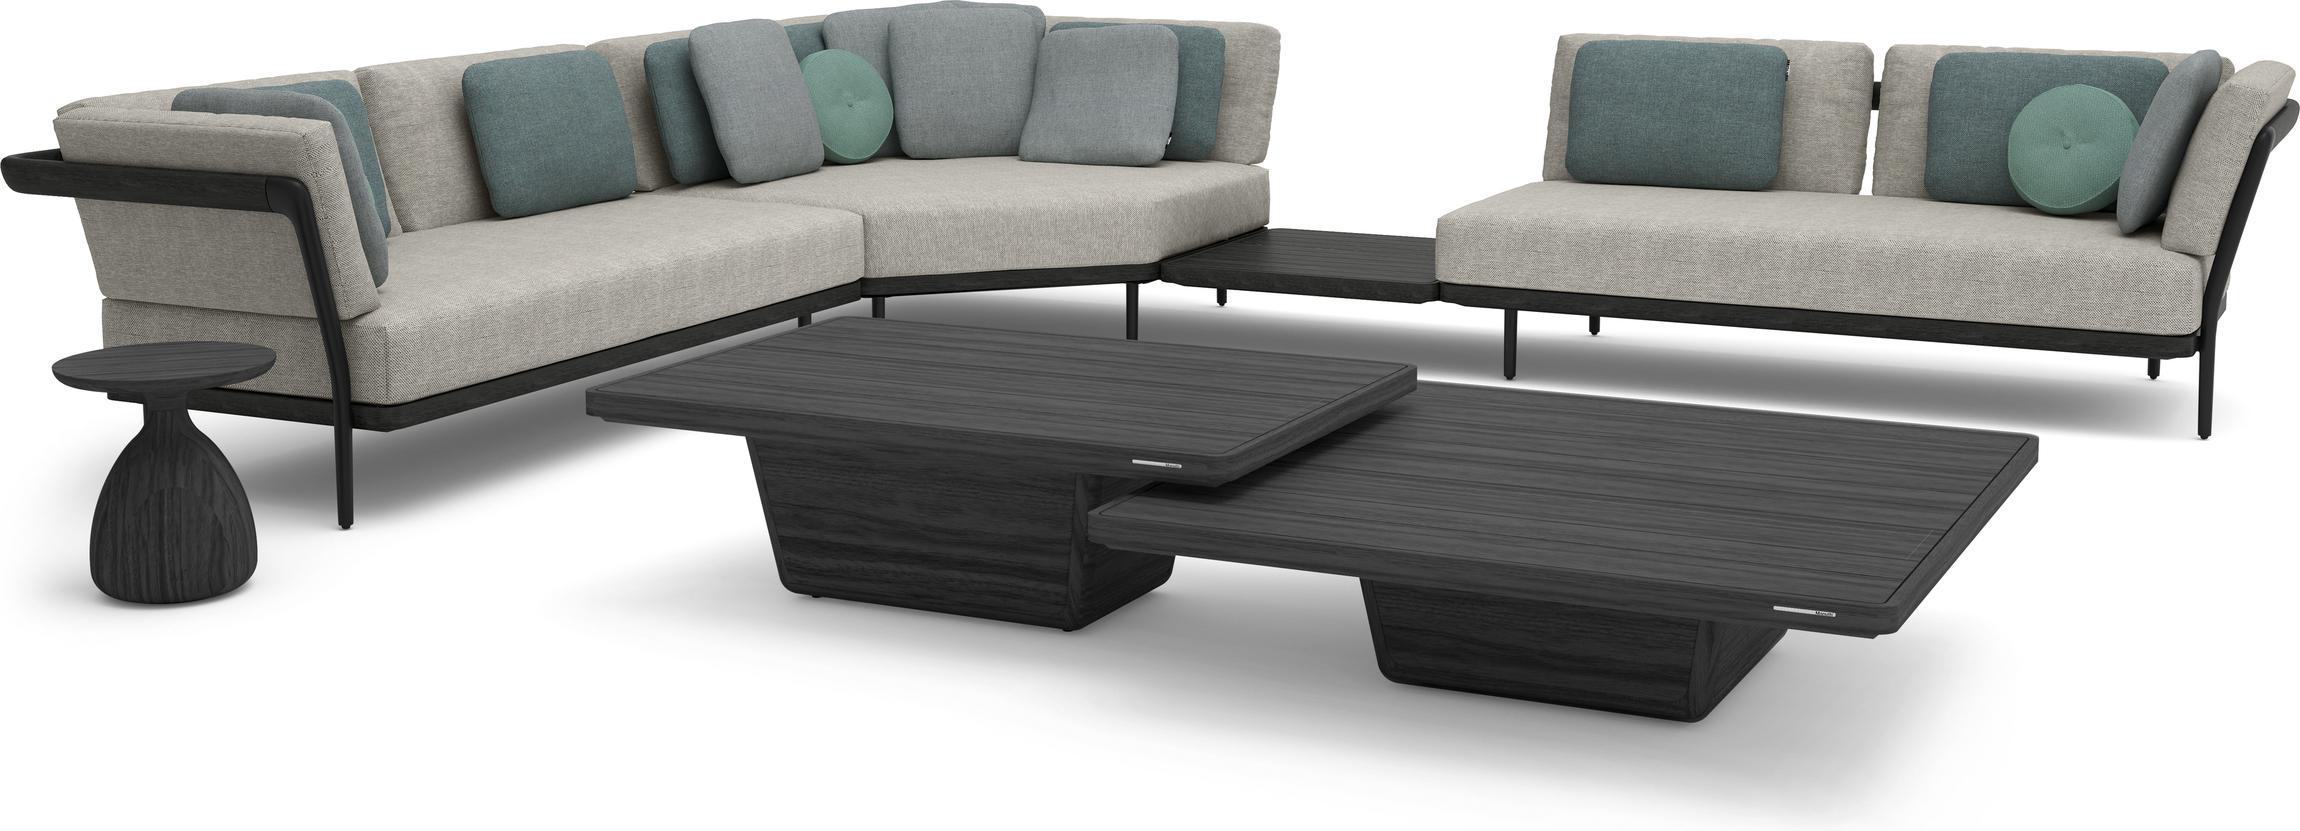 Cobi coffee table 113x113x30 teak scuro